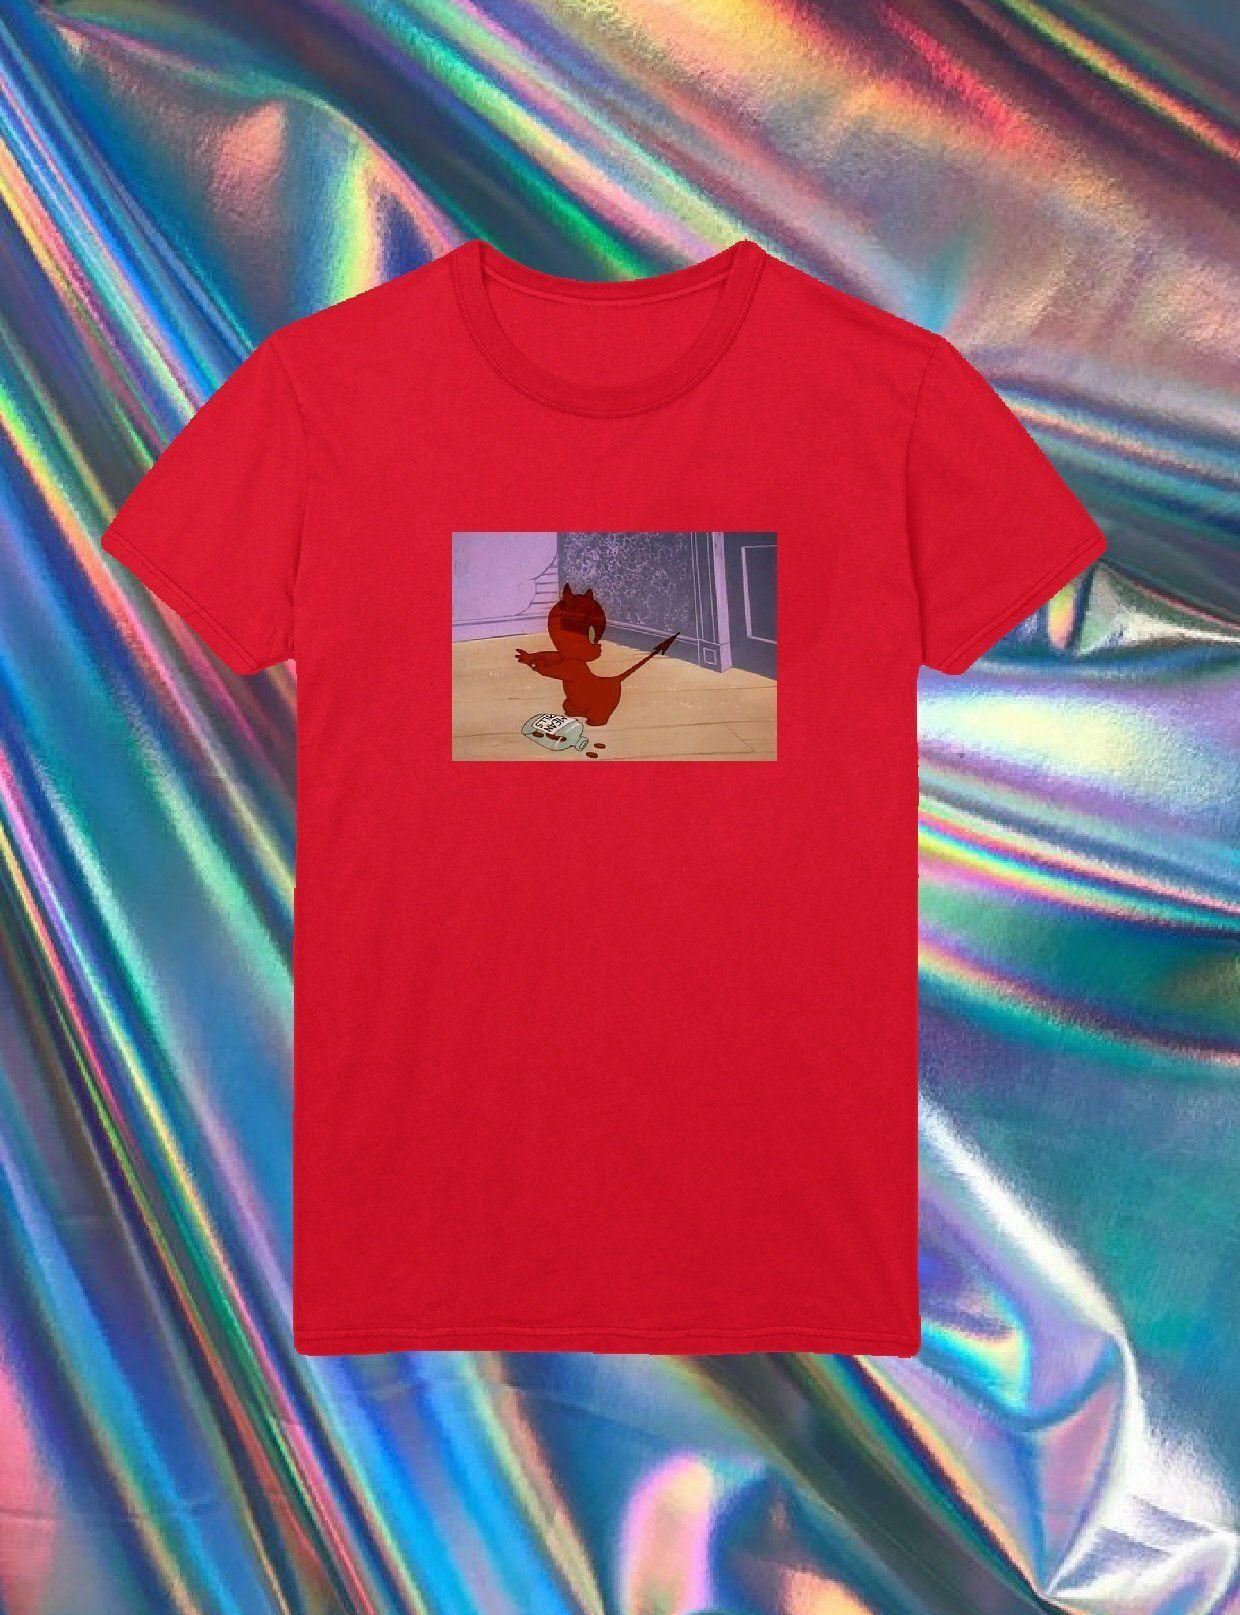 025fe25c Adult Unisex Baby Devil Cartoon, Tumblr Shirt, Aesthetic Shirt ...